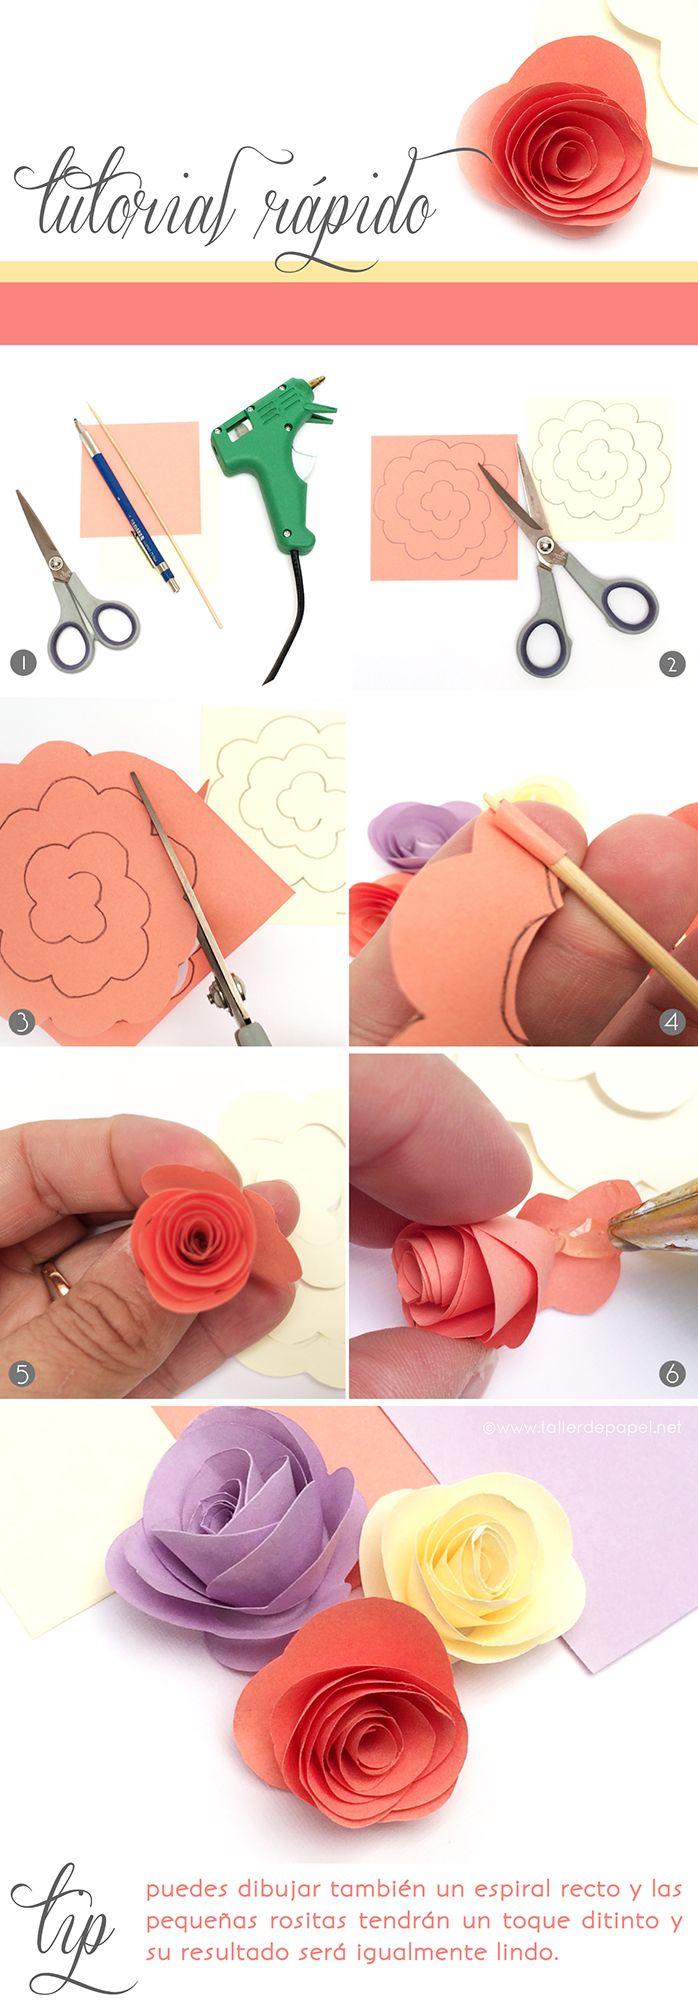 DIY Quick Tutorial: Making Mini Paper Rosettes! | DIY Fun Tips